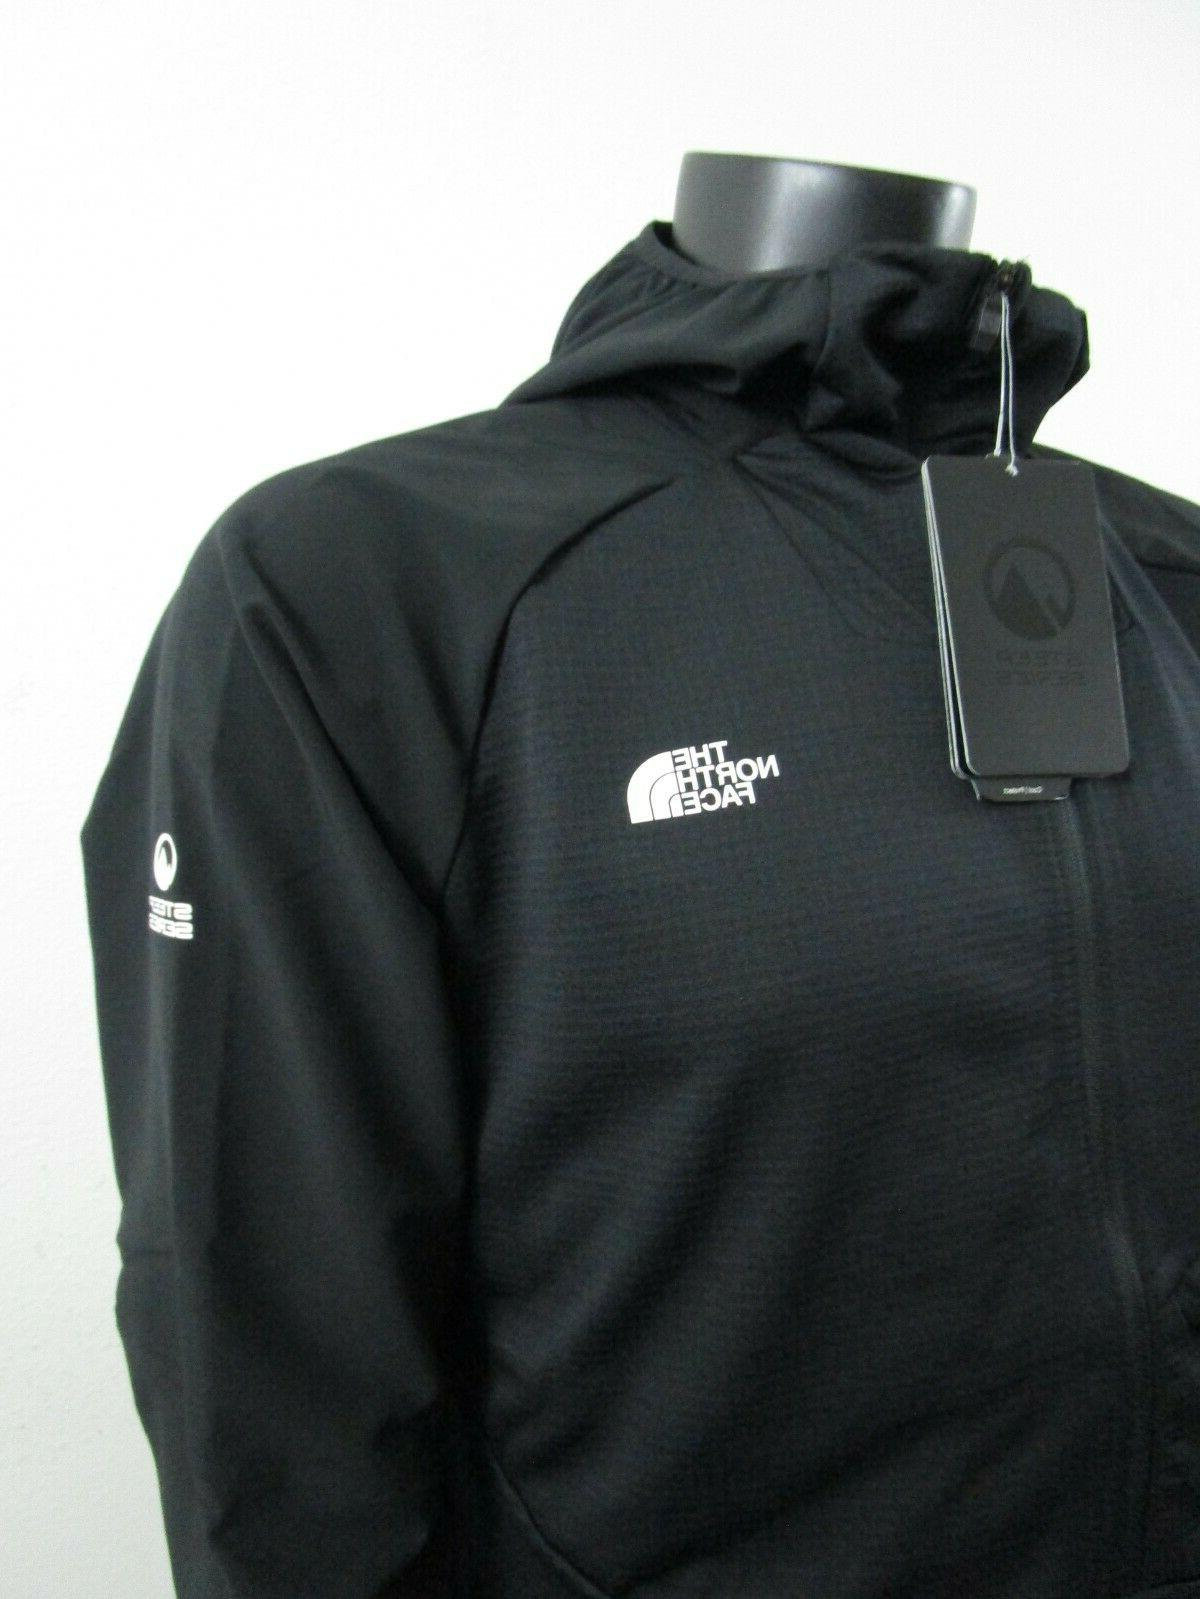 NWT Mens TNF North Face Zip Series Jacket